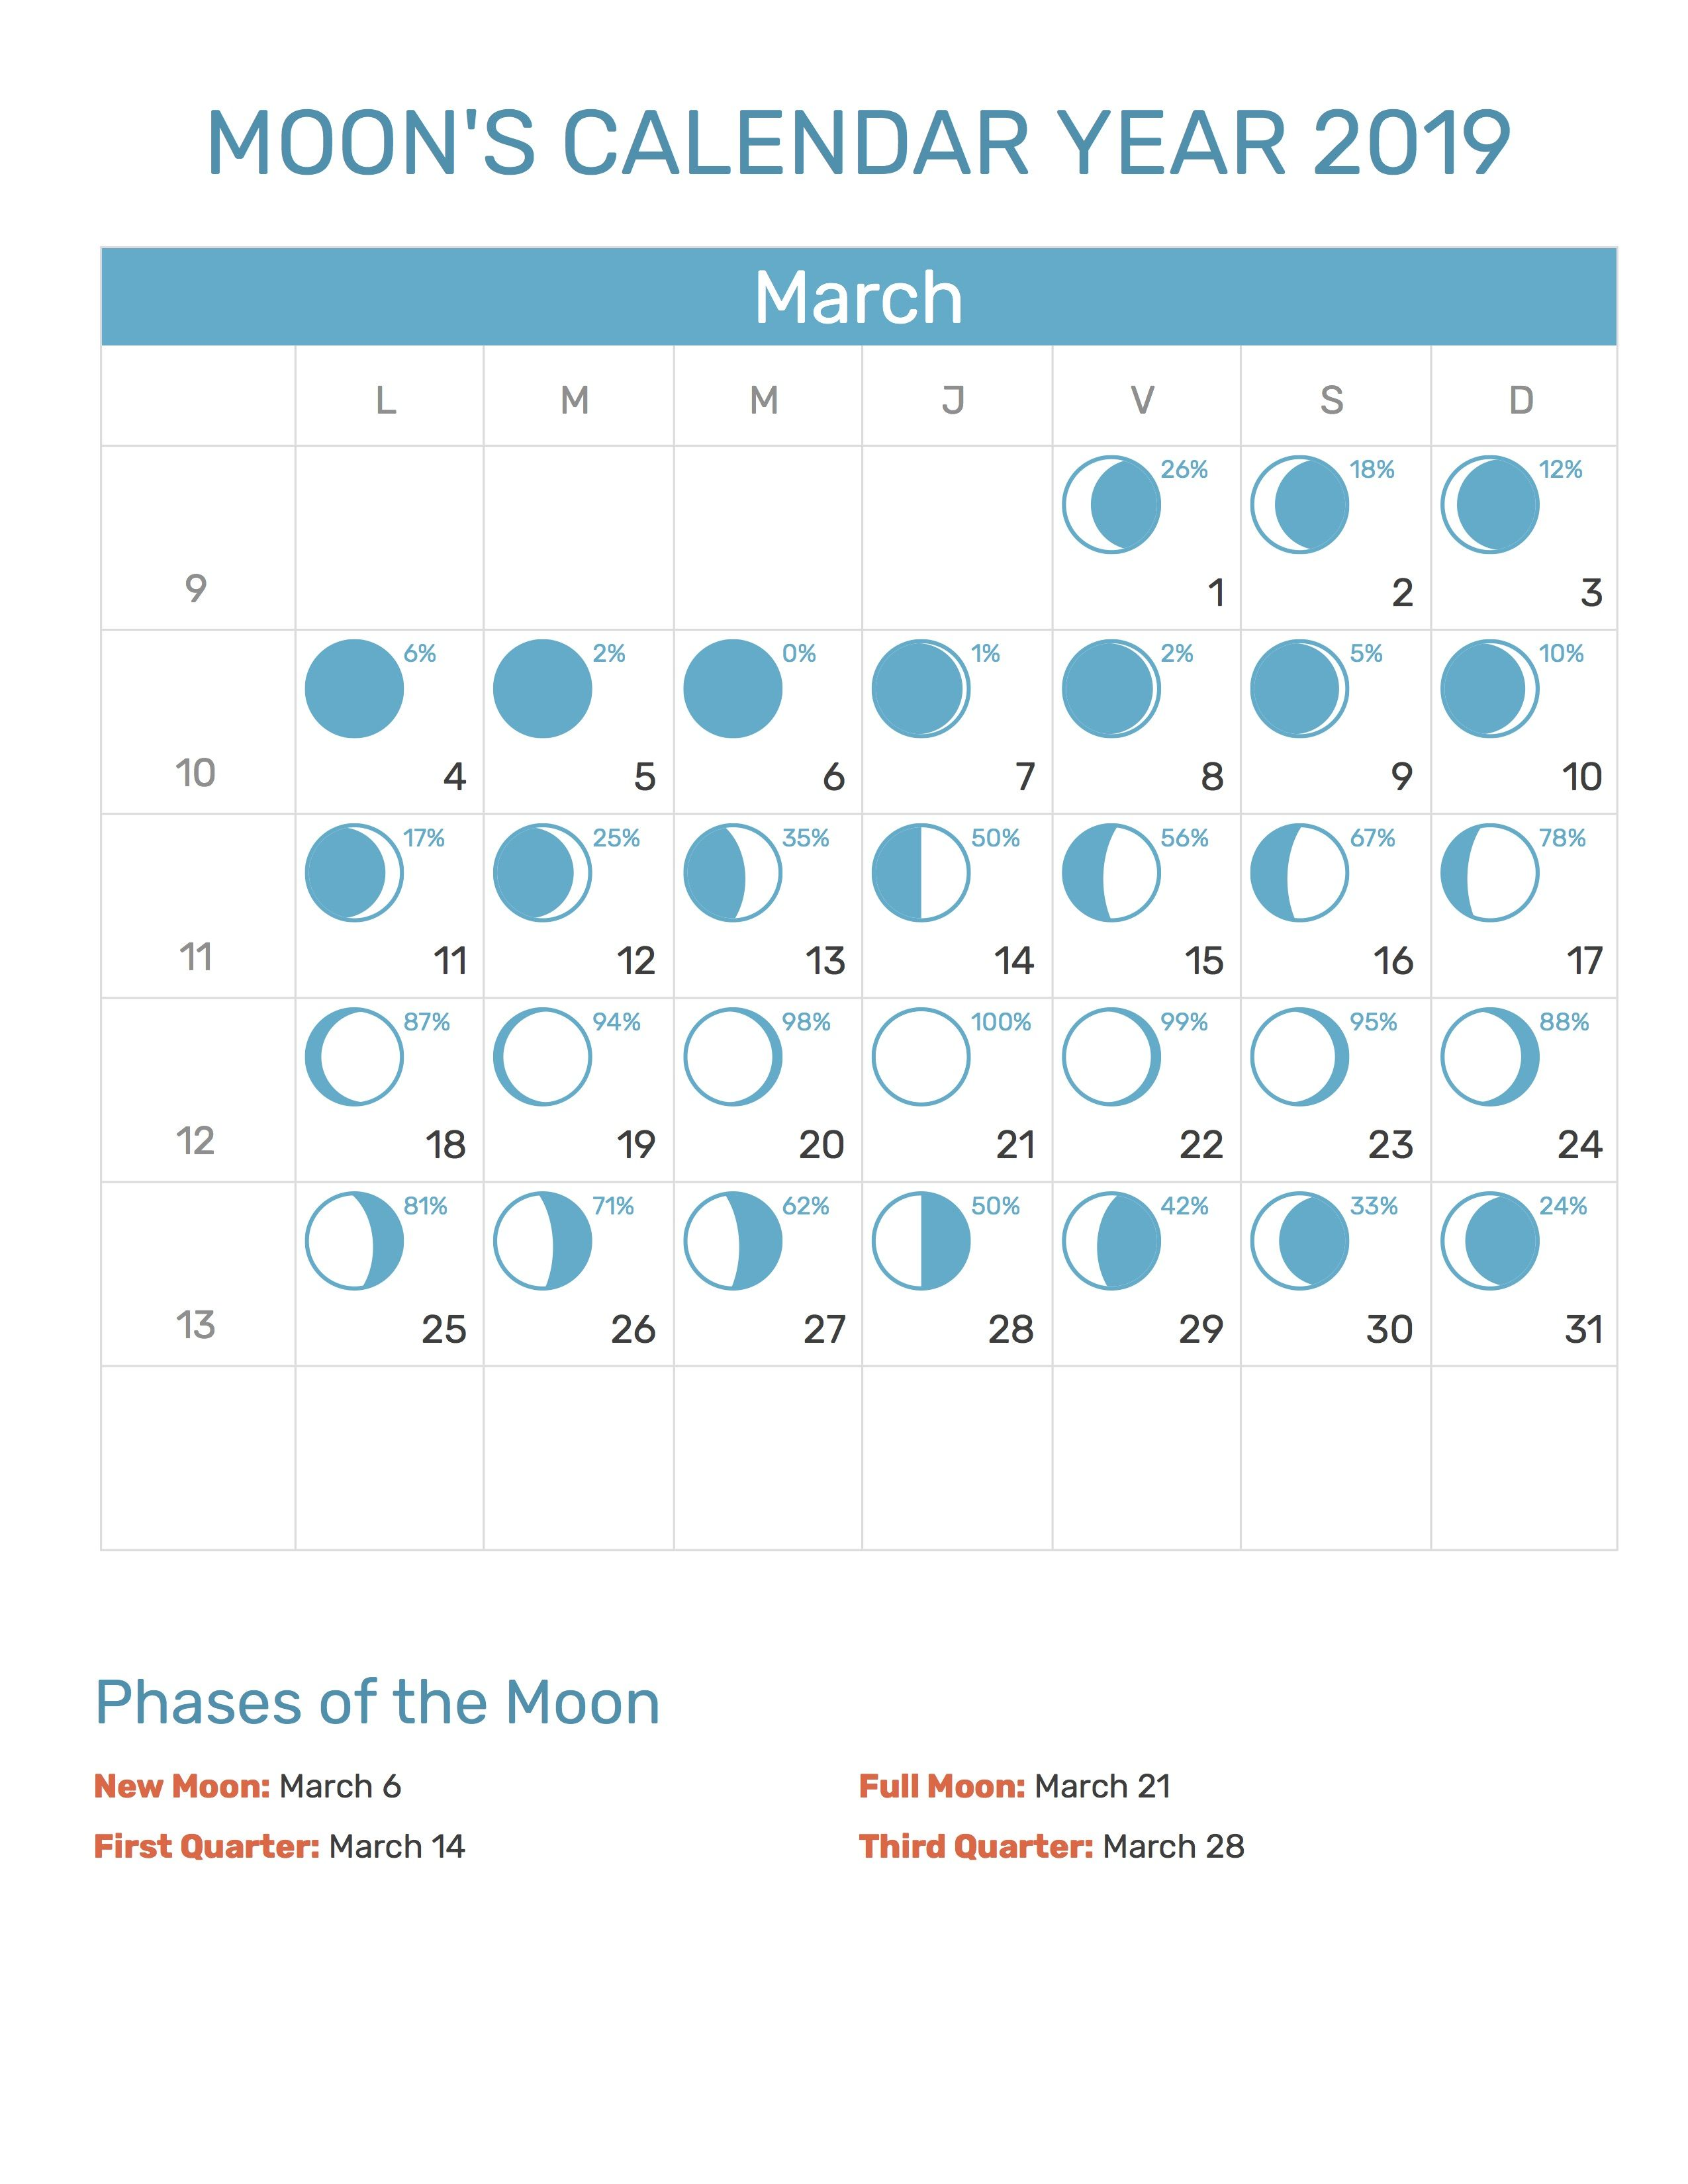 Blue Moon Calendar 2019 March 2019 Moon Calendar #mooncalendar #2019moonphases #march